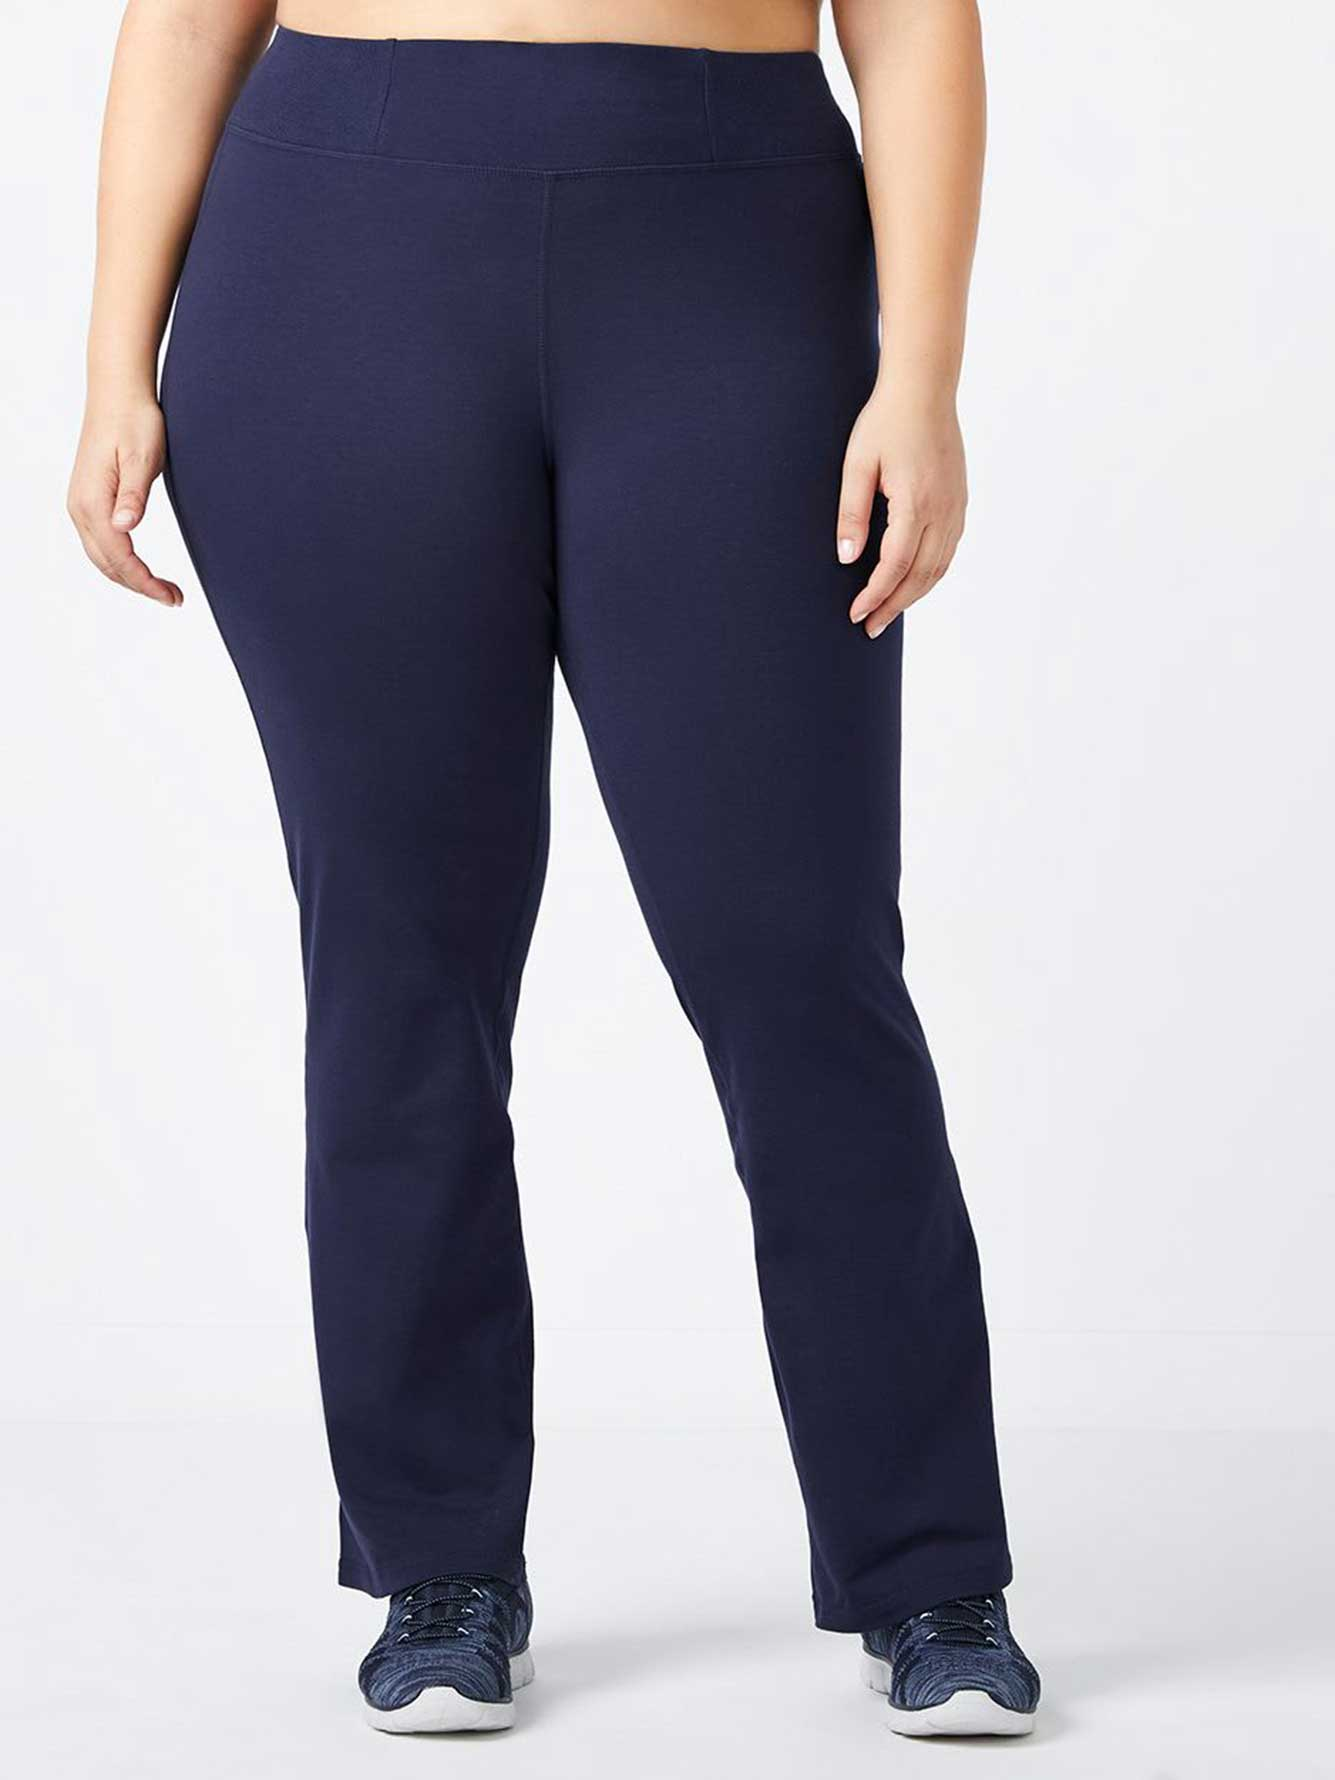 Yoga petite pants 8